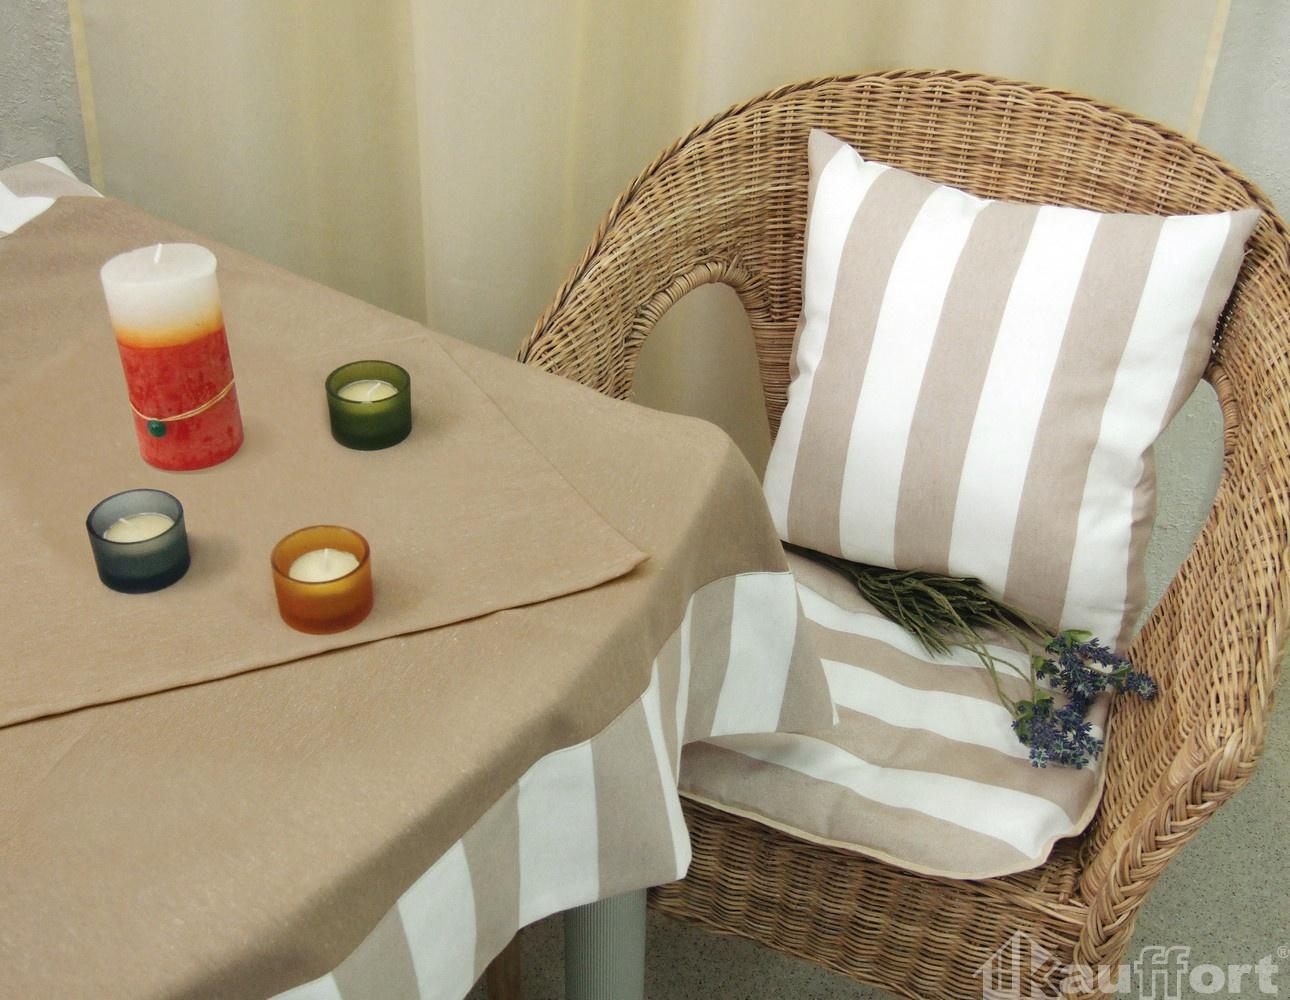 Подушки на стул Kauffort Подушка на стул Krit Цвет: Молоко-Светло-Коричневый (40х40) подушка на стул арти м райский сад